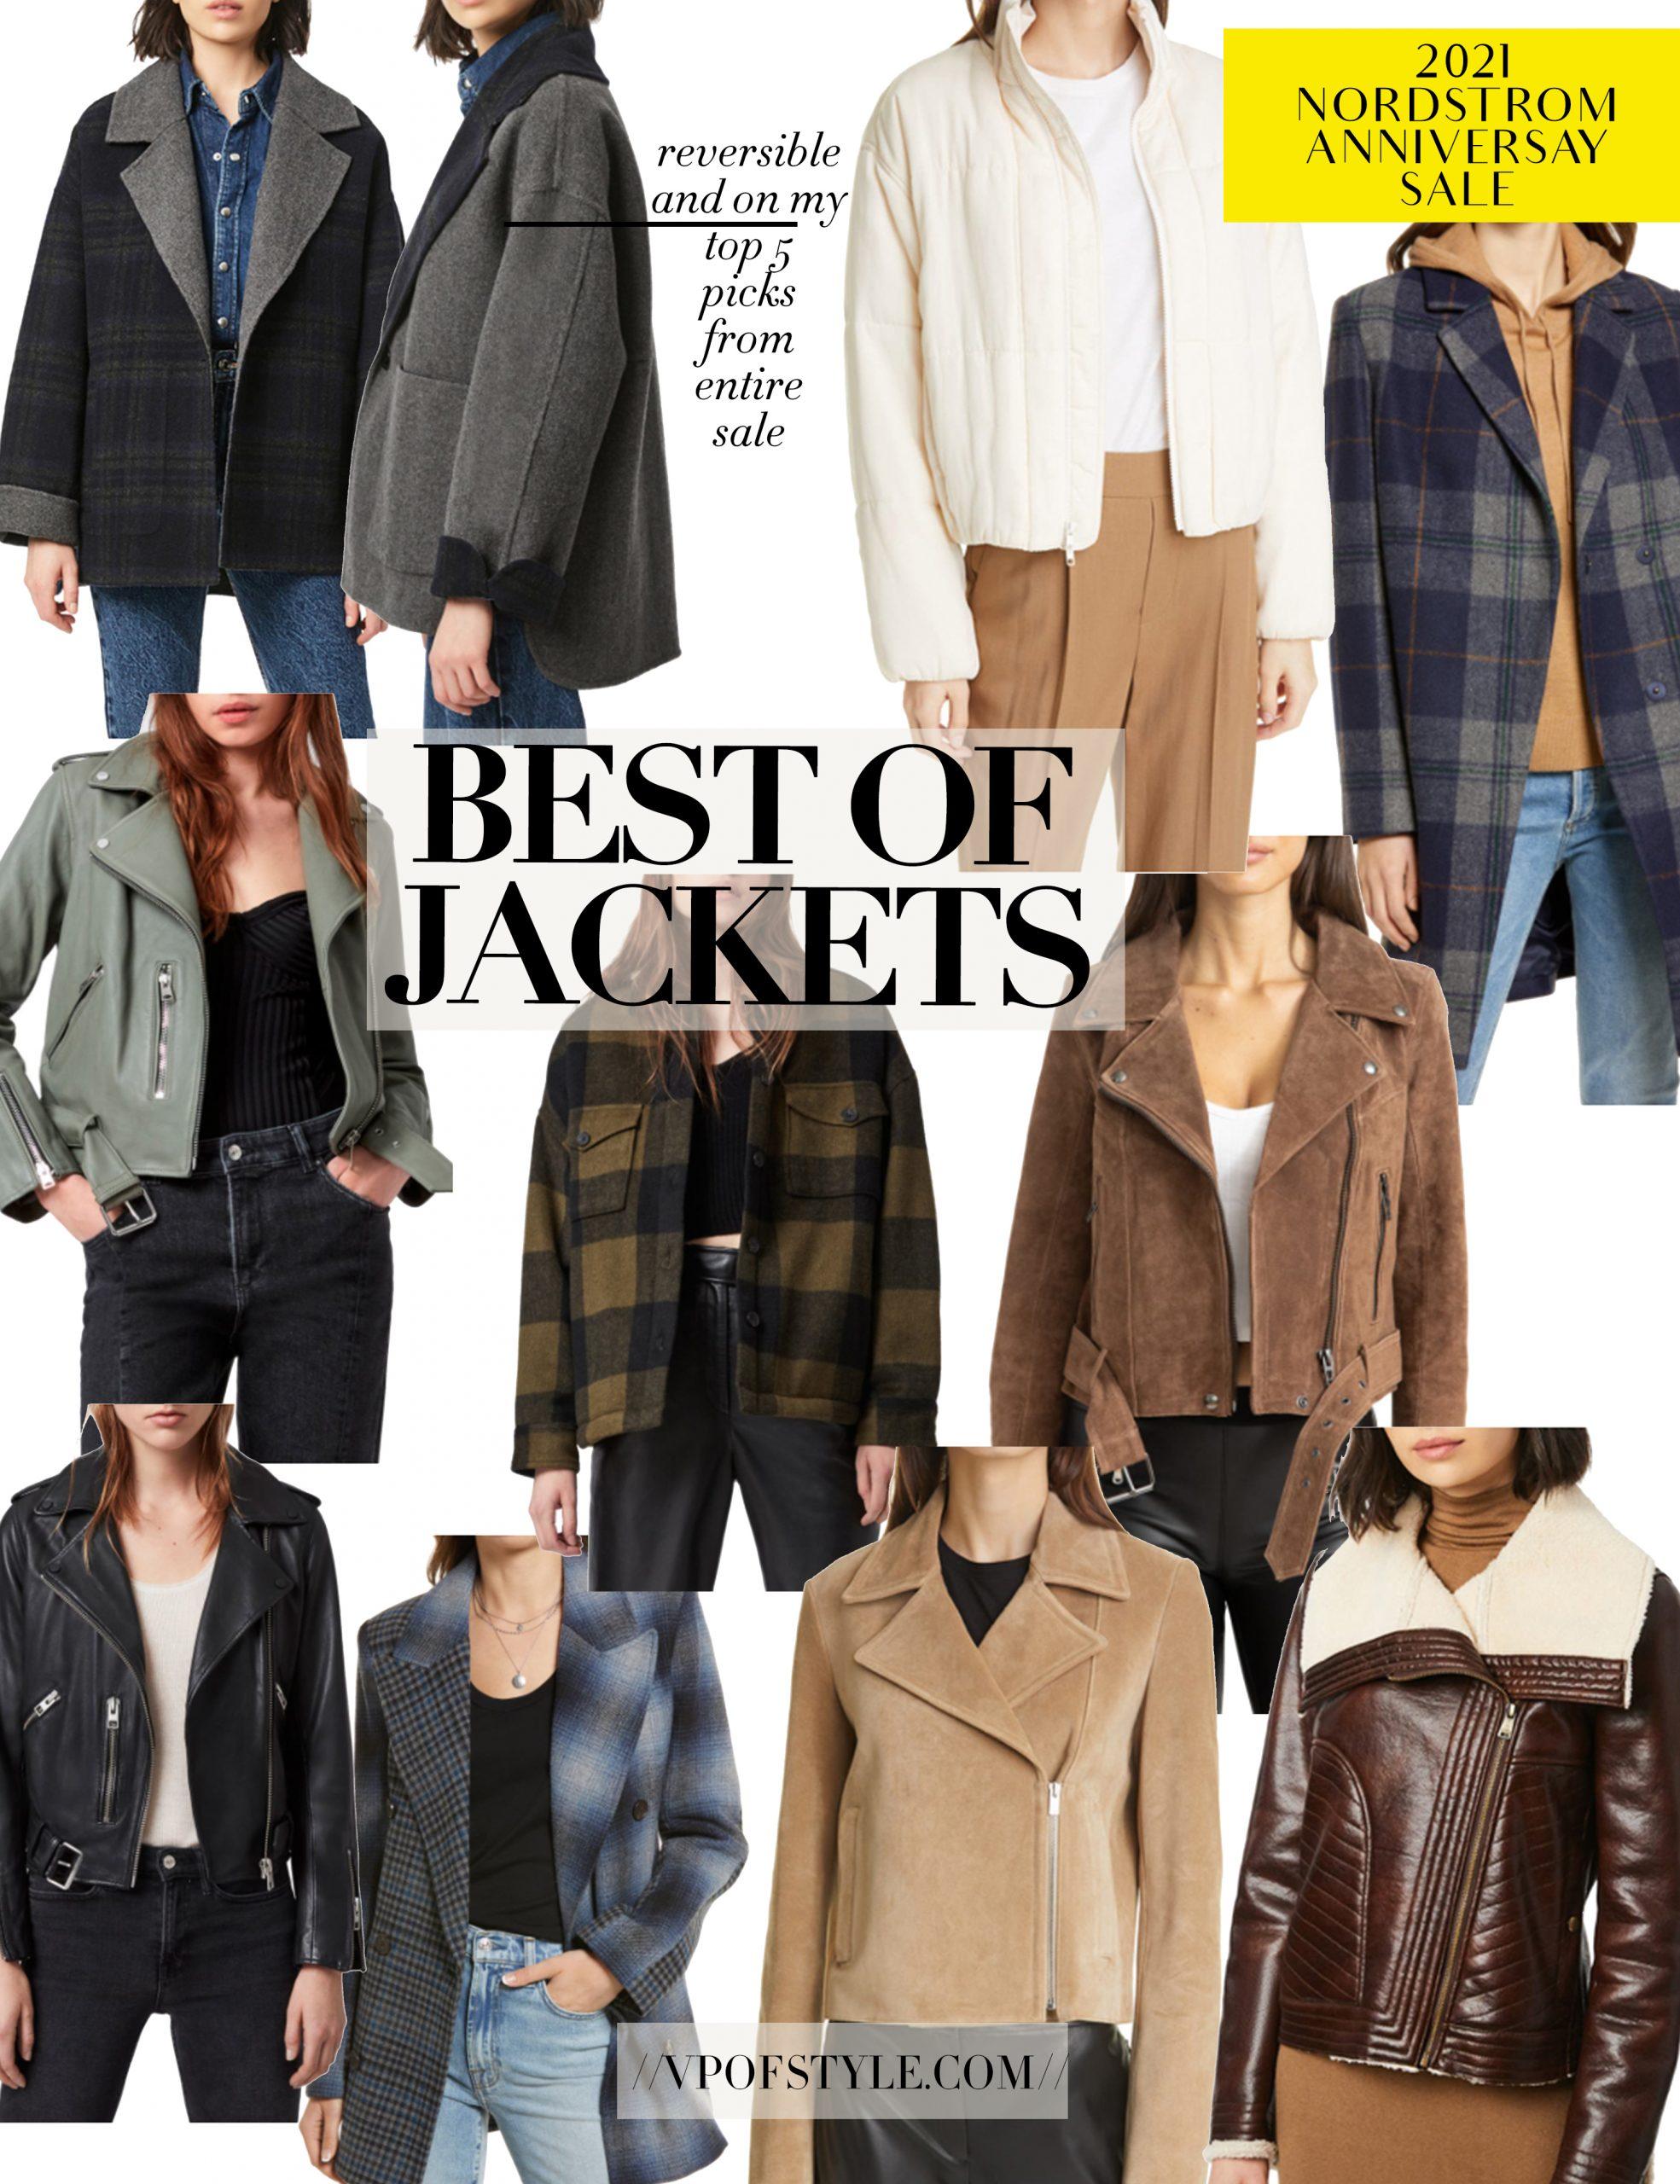 Nordstrom Anniversary Sale top jacket picks